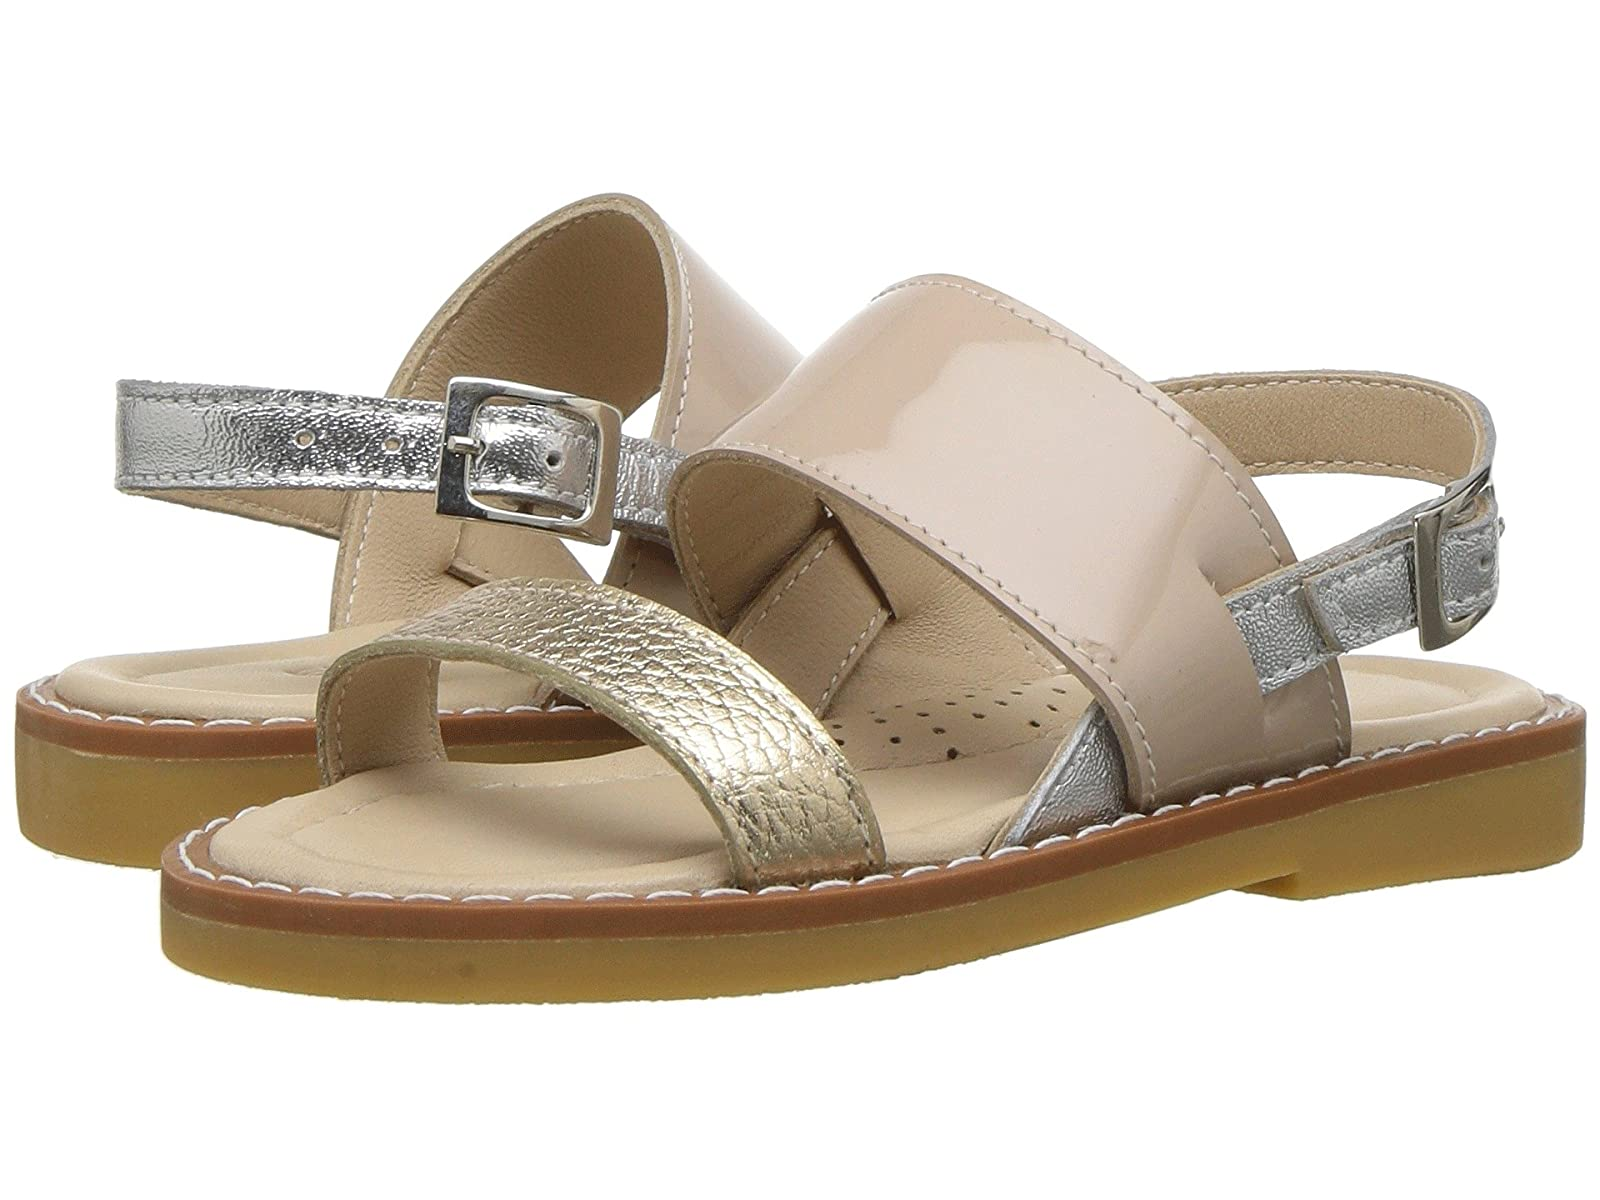 Elephantito Paloma Sandal (Toddler/Little Kid/Big Kid)Cheap and distinctive eye-catching shoes